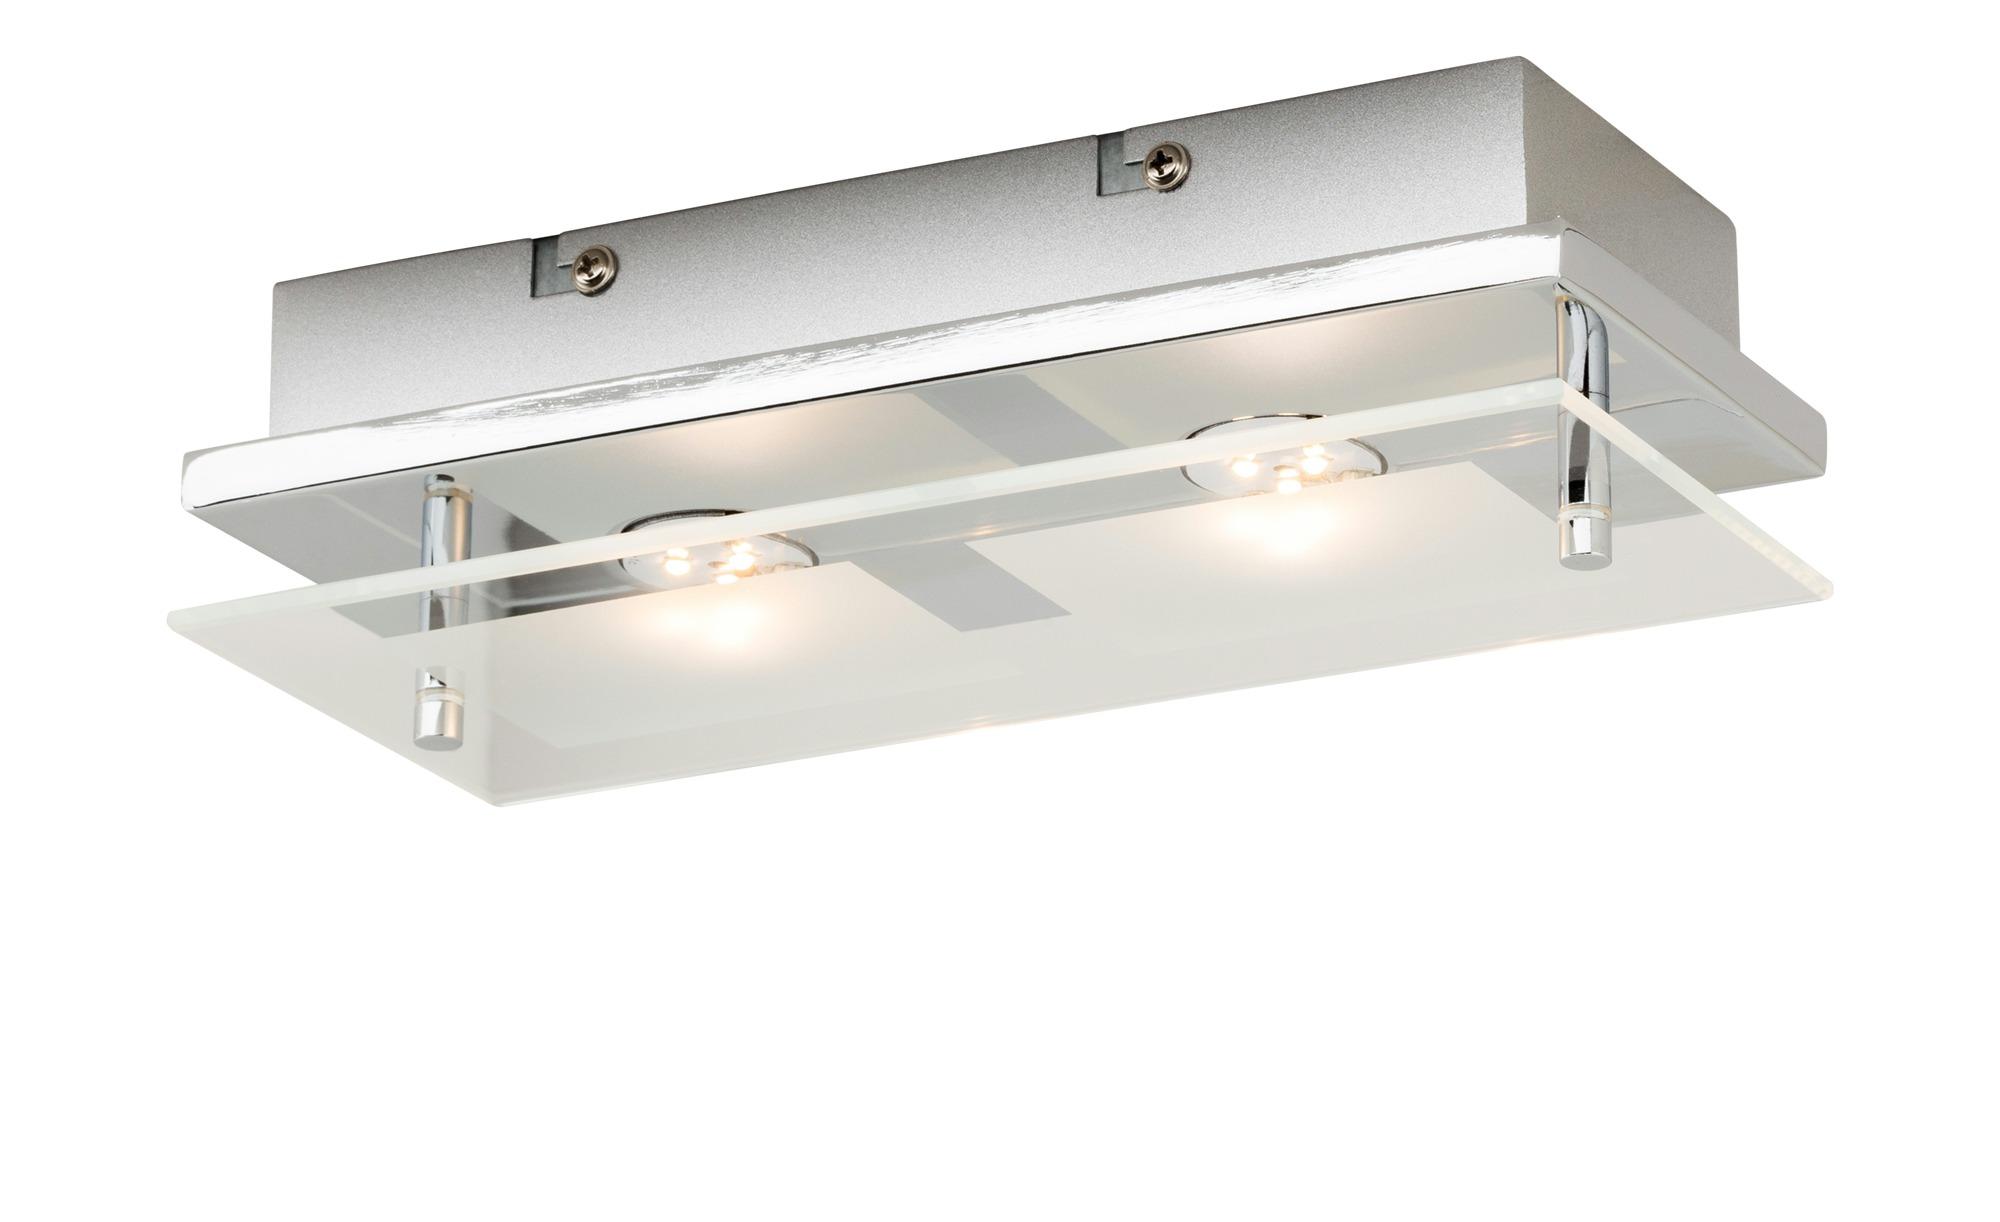 Paul Neuhaus LED Deckenleuchte rechteckig 2 Spots ¦ silber ¦ Maße (cm): B: 24 Lampen & Leuchten > Innenleuchten > Deckenleuchten - Höffner